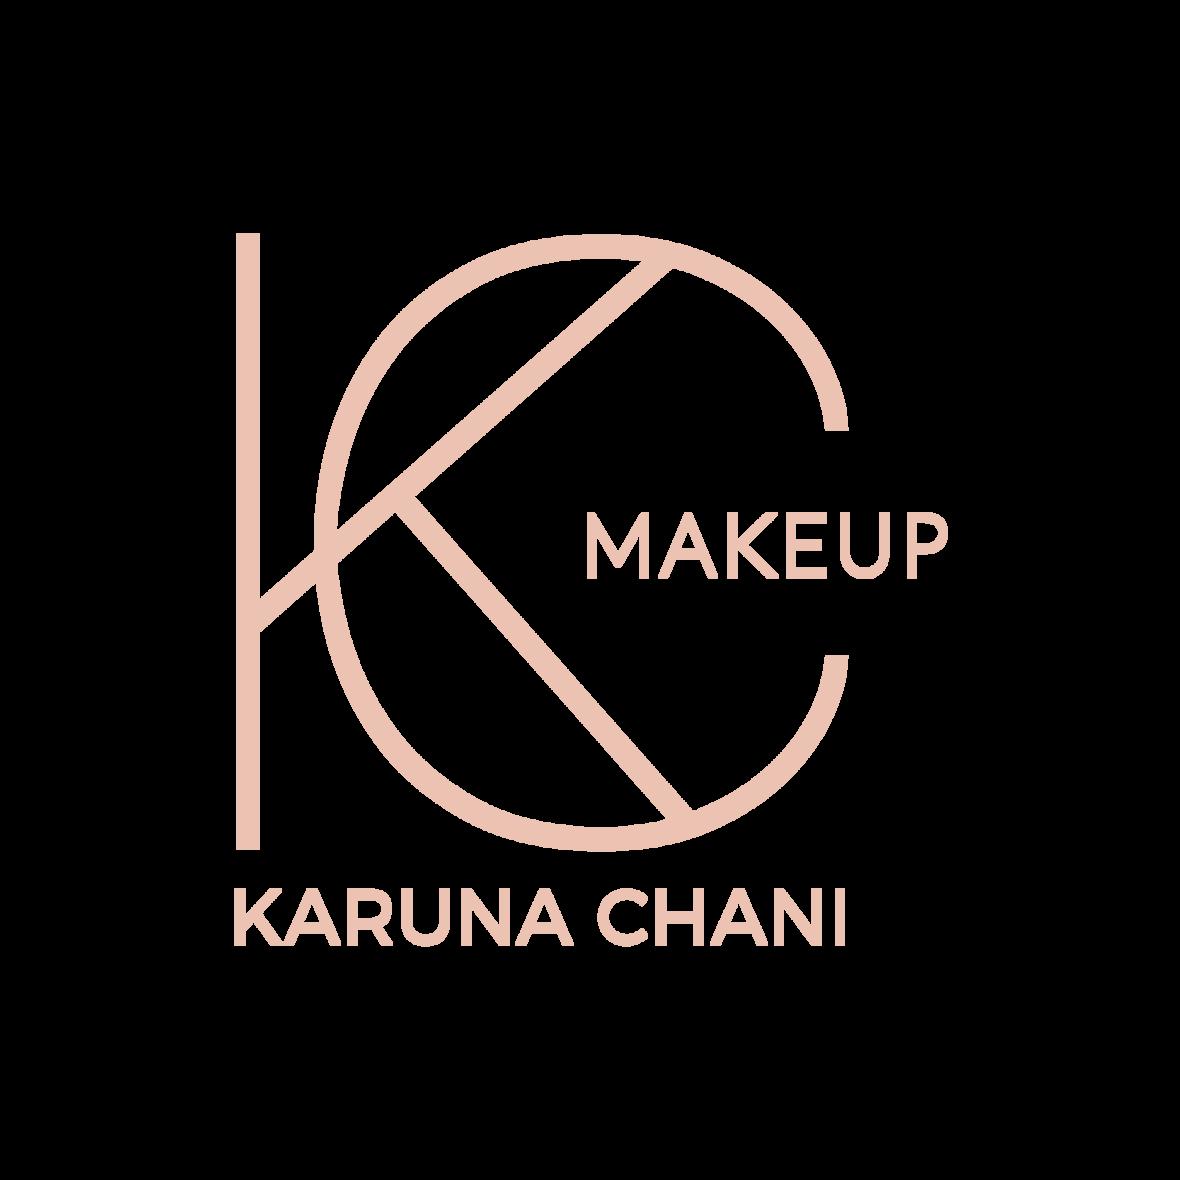 Kc logo nude  1